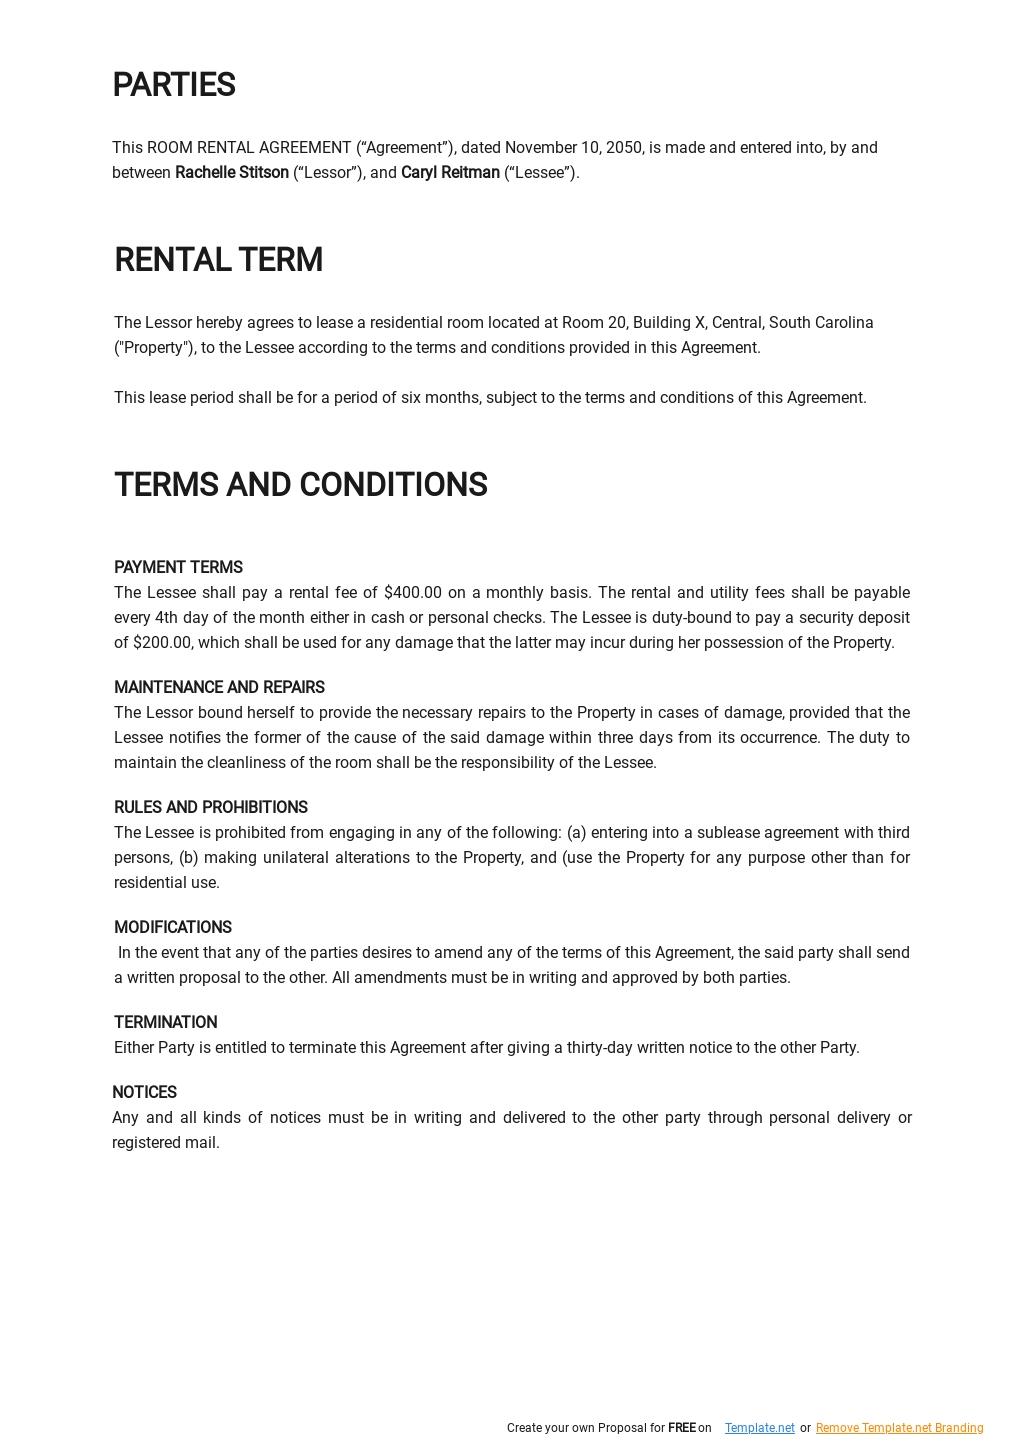 Simple Room Rental Agreement Template 1.jpe